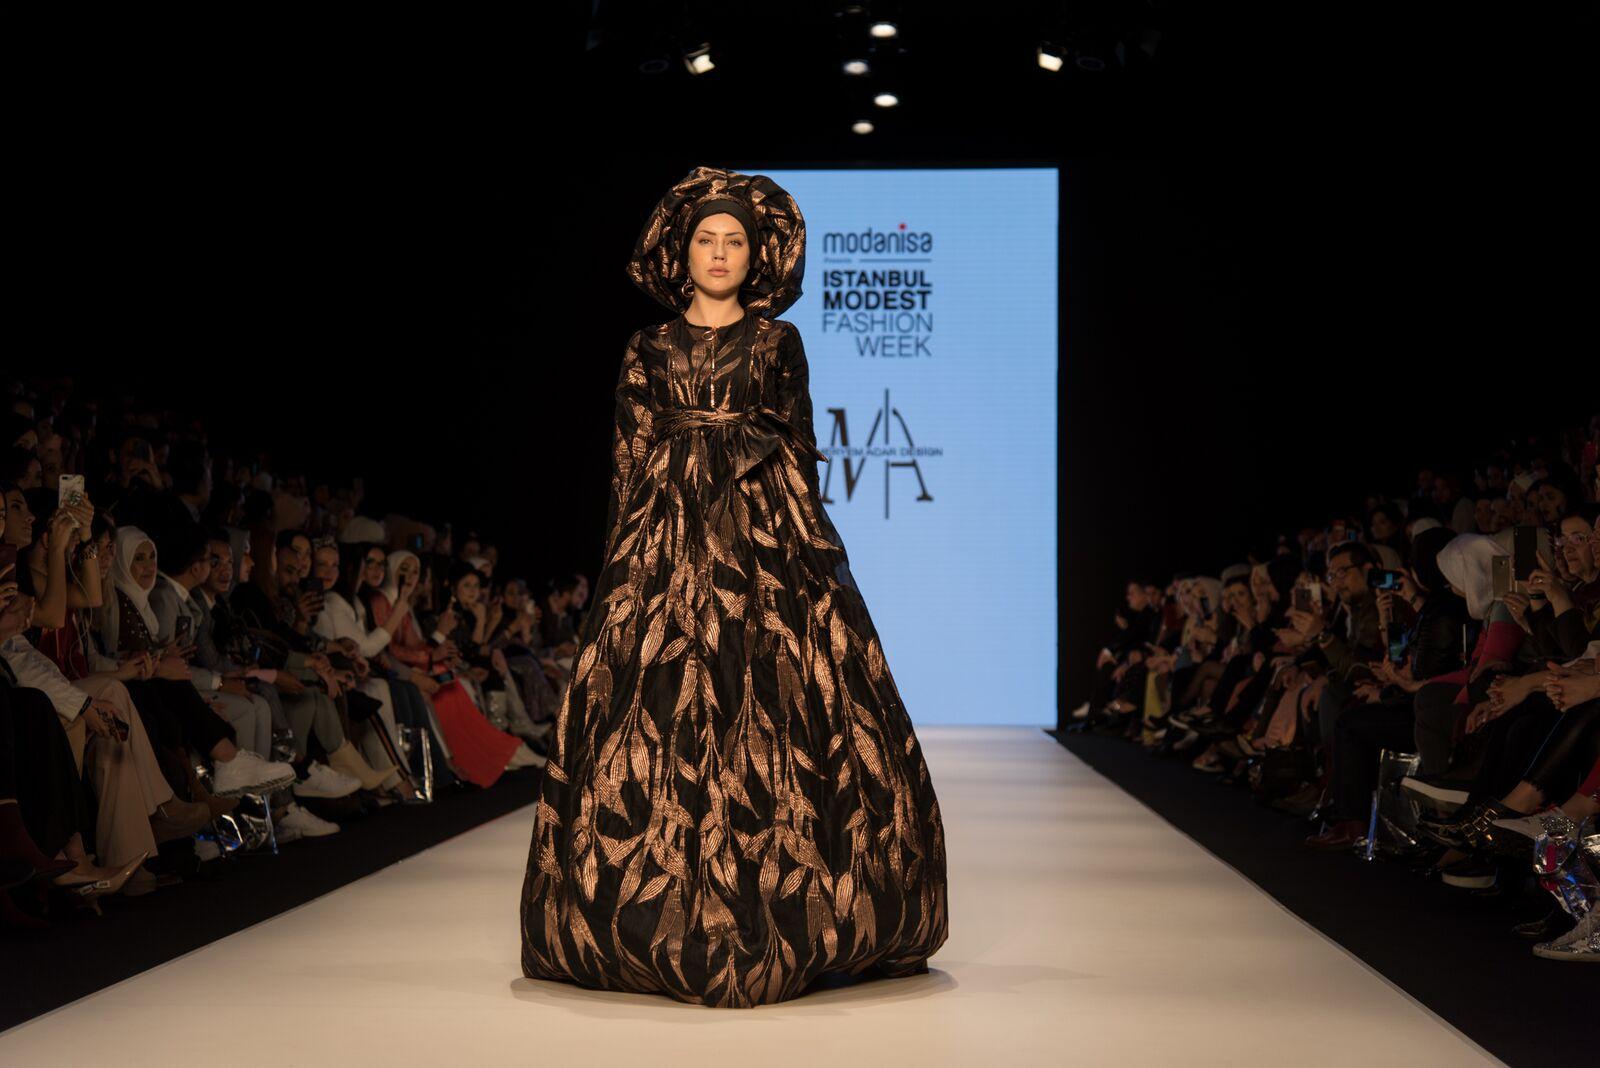 Meryem acar at istanbul modest fashion week 2019 day 1